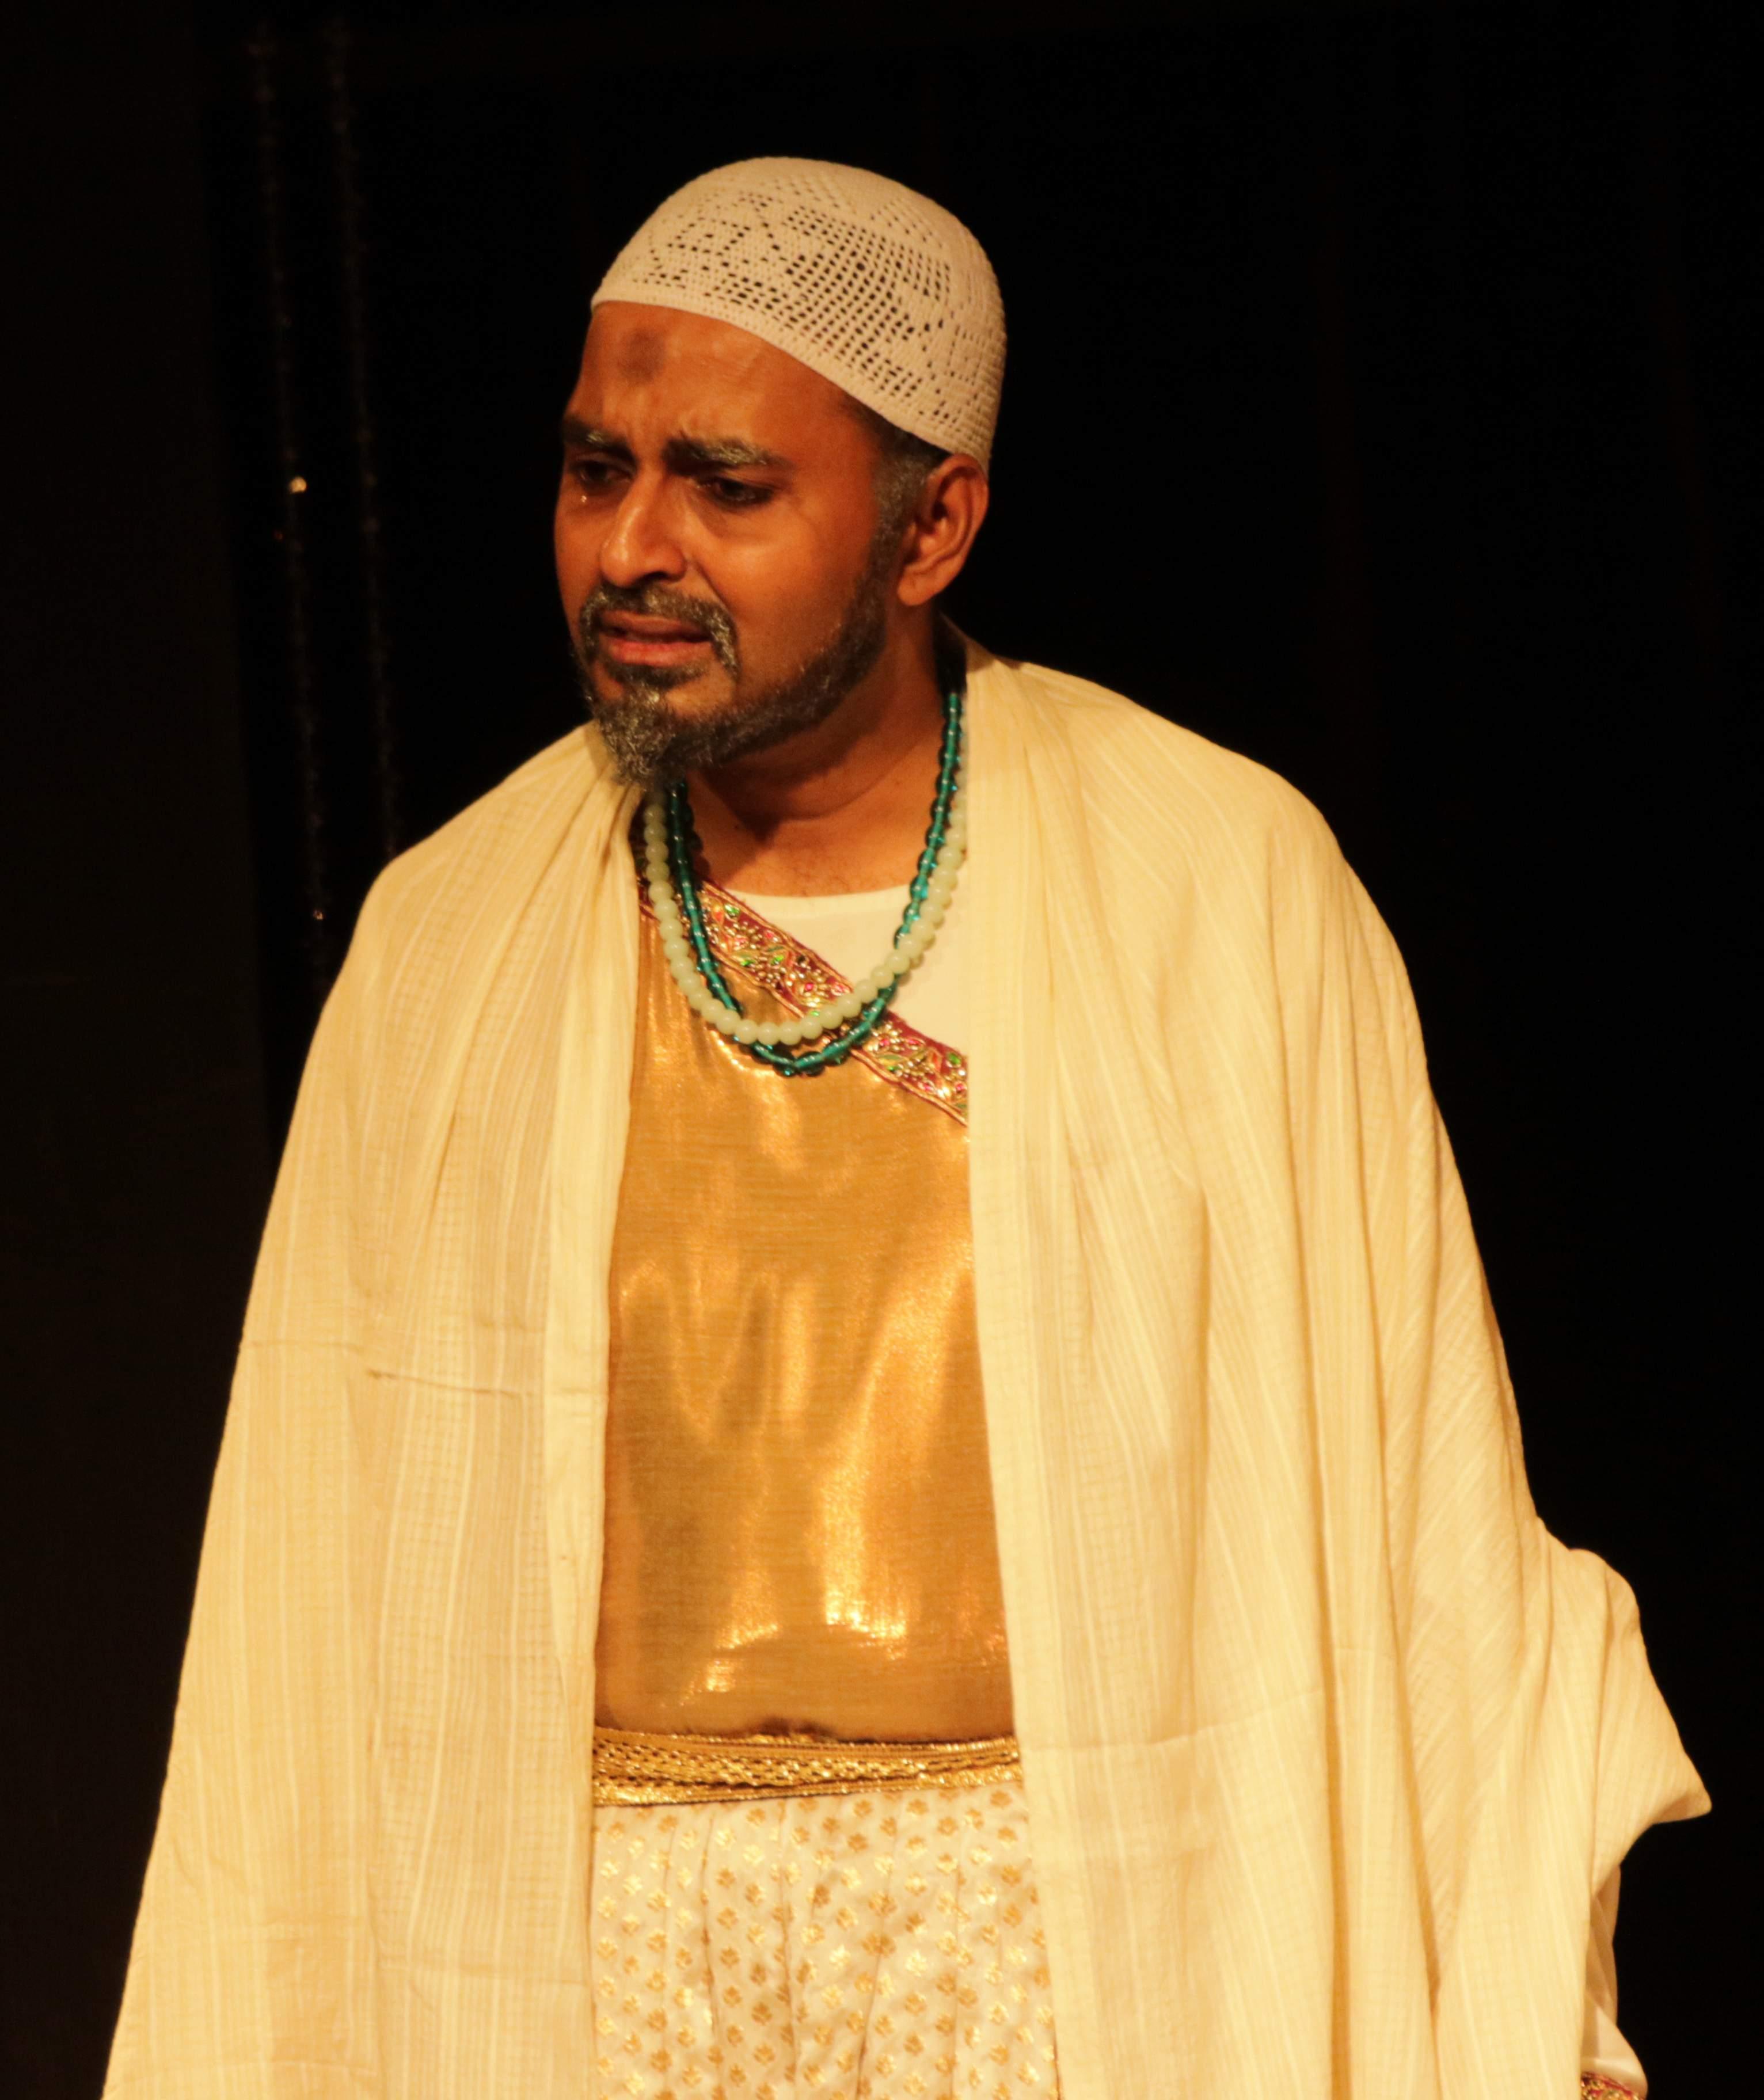 Swami Nathan as Aurangzeb